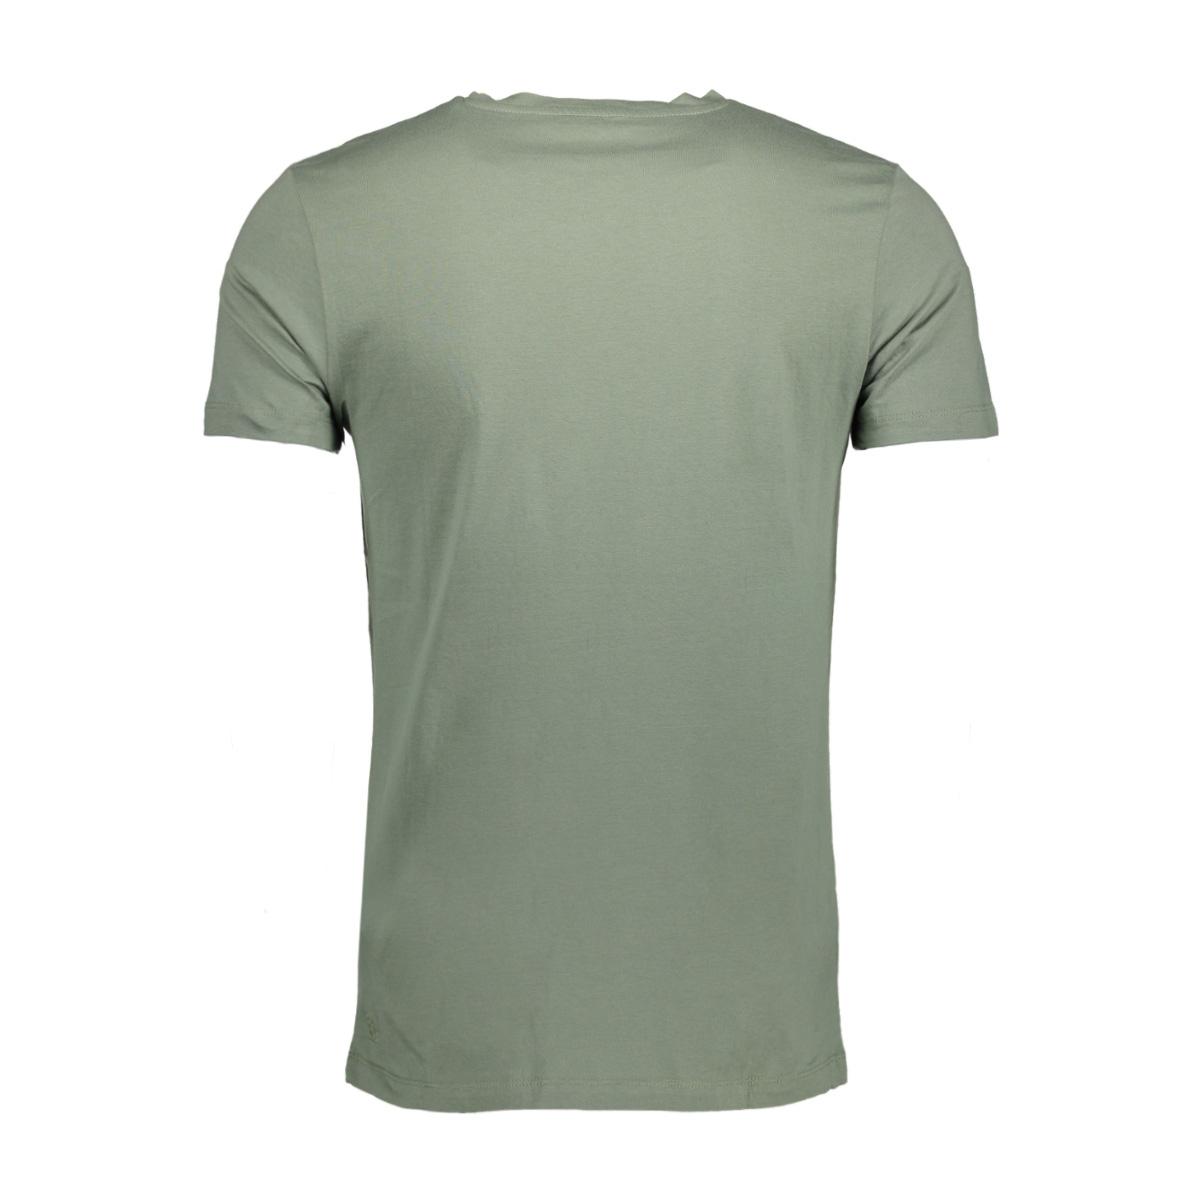 1055467.09.12 tom tailor t-shirt 7057